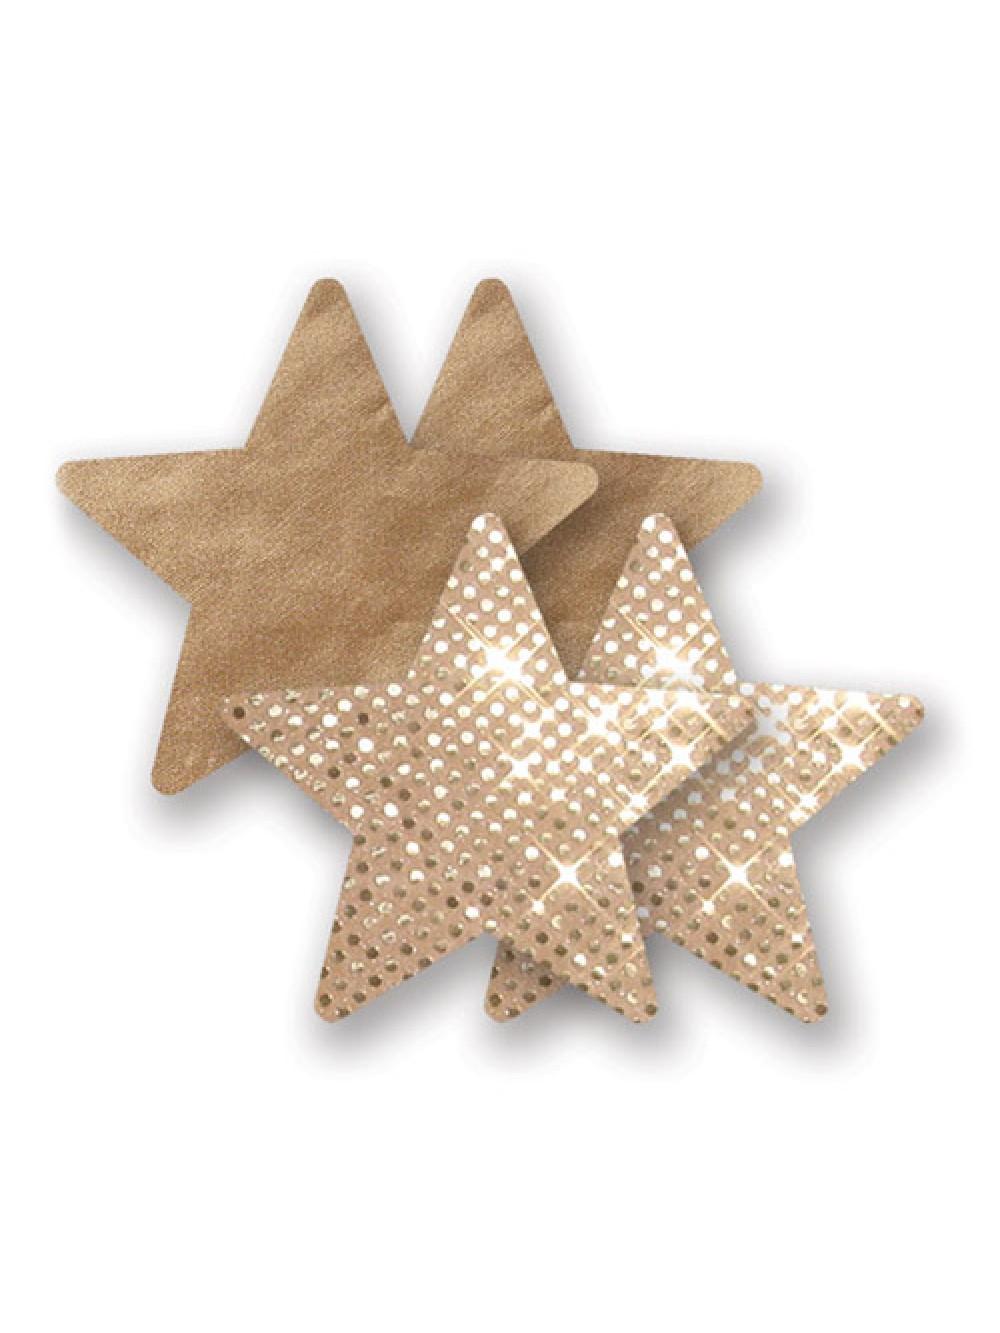 Nippies Pasties - Gold Super Star 876651000382